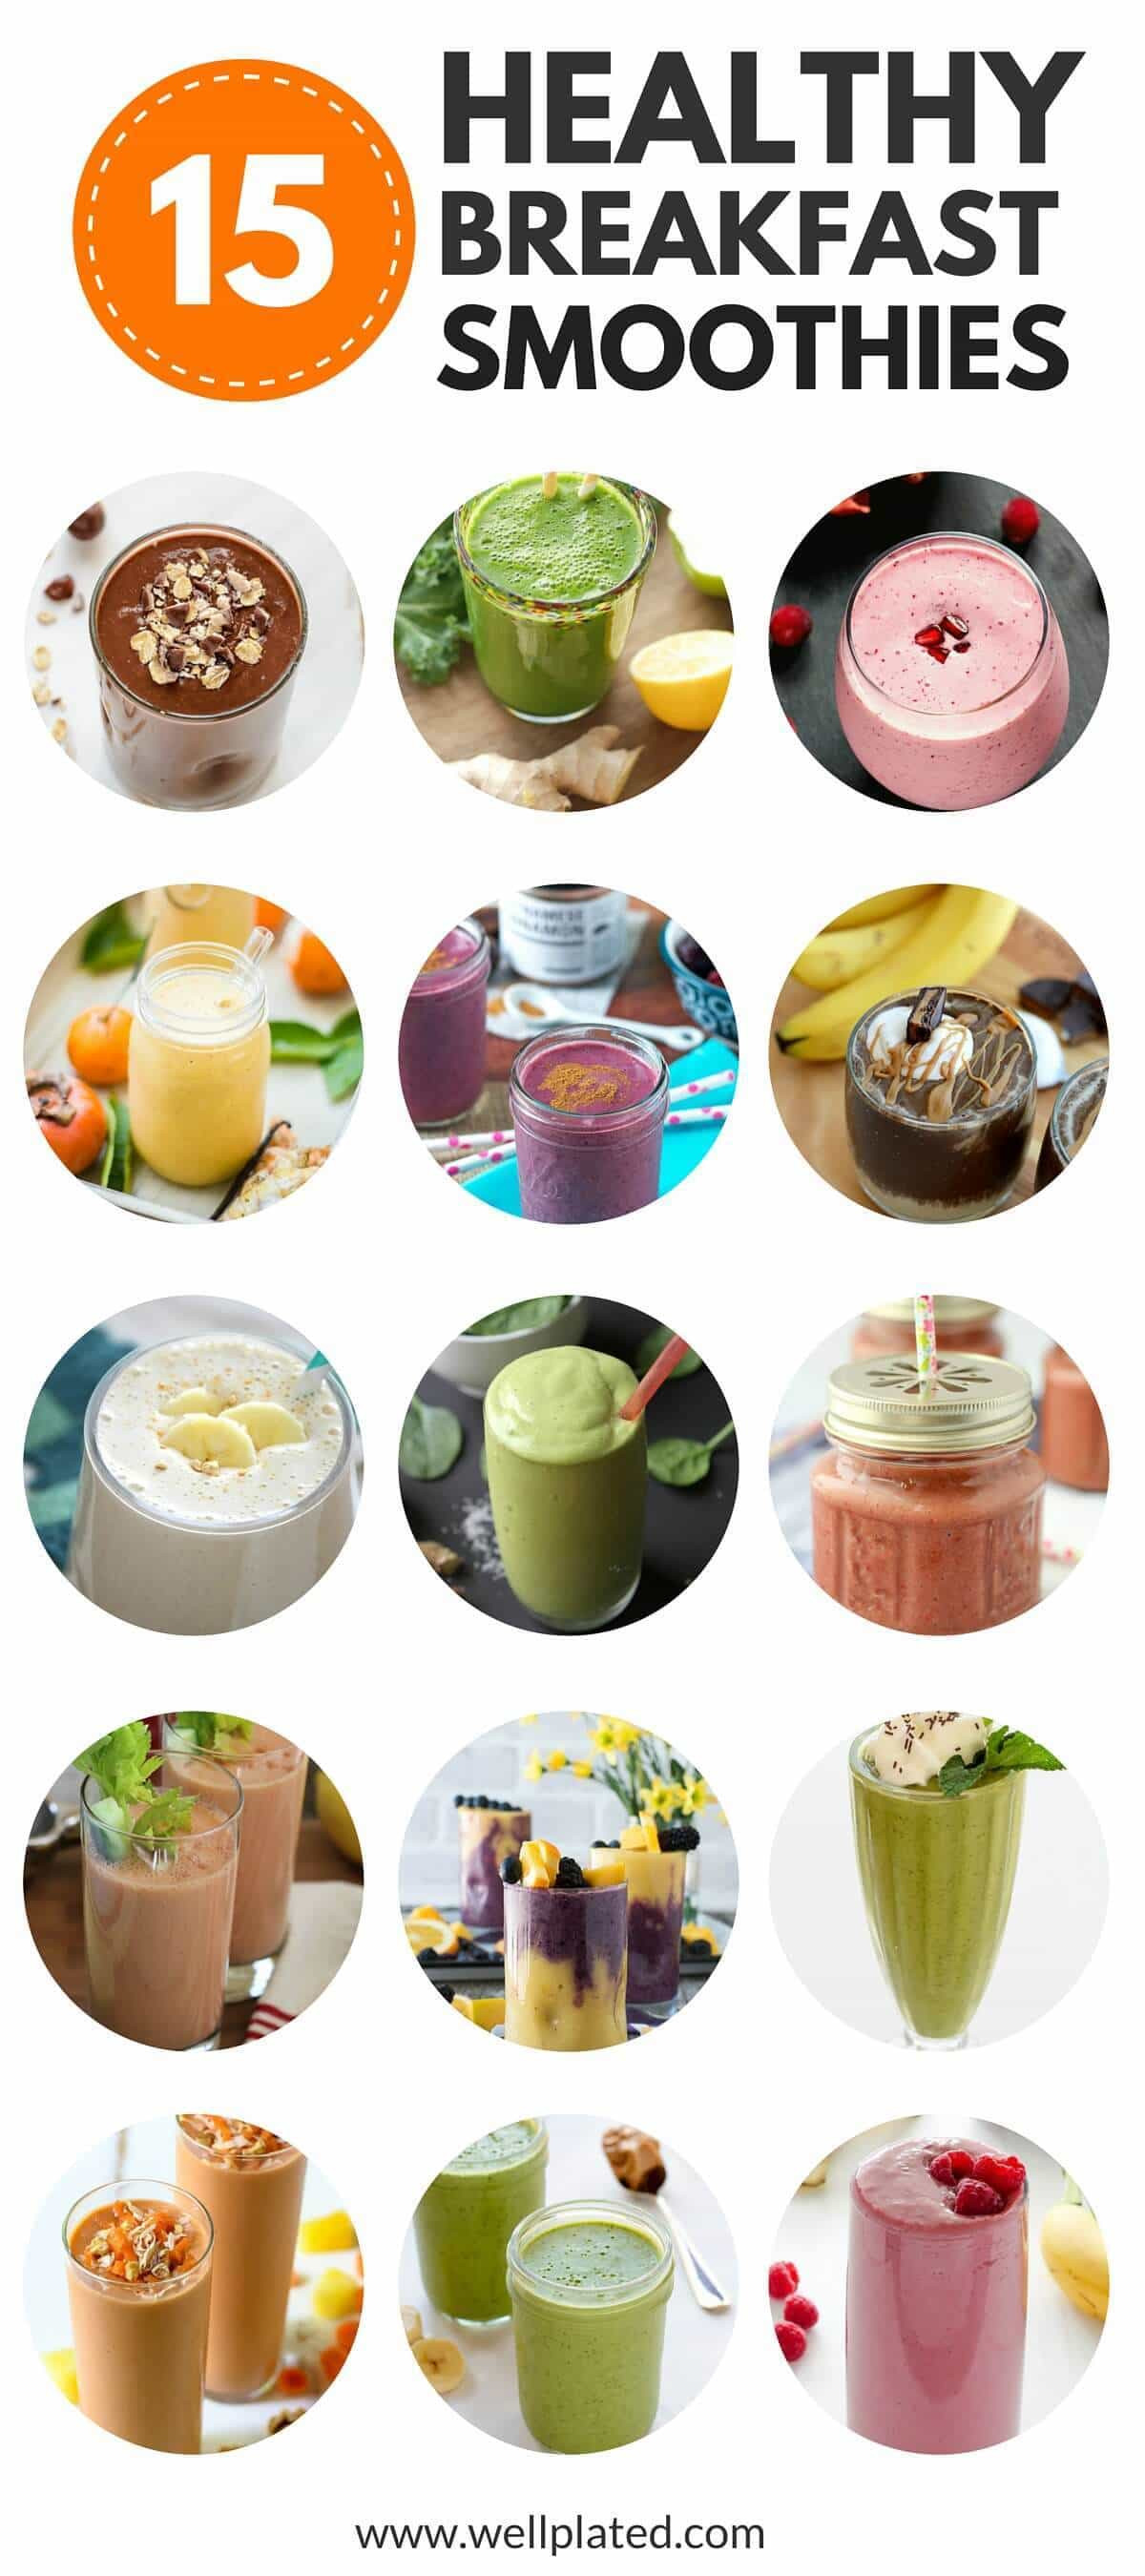 Healthy Breakfast Shake Recipes the Best Ideas for the Best 15 Healthy Breakfast Smoothies